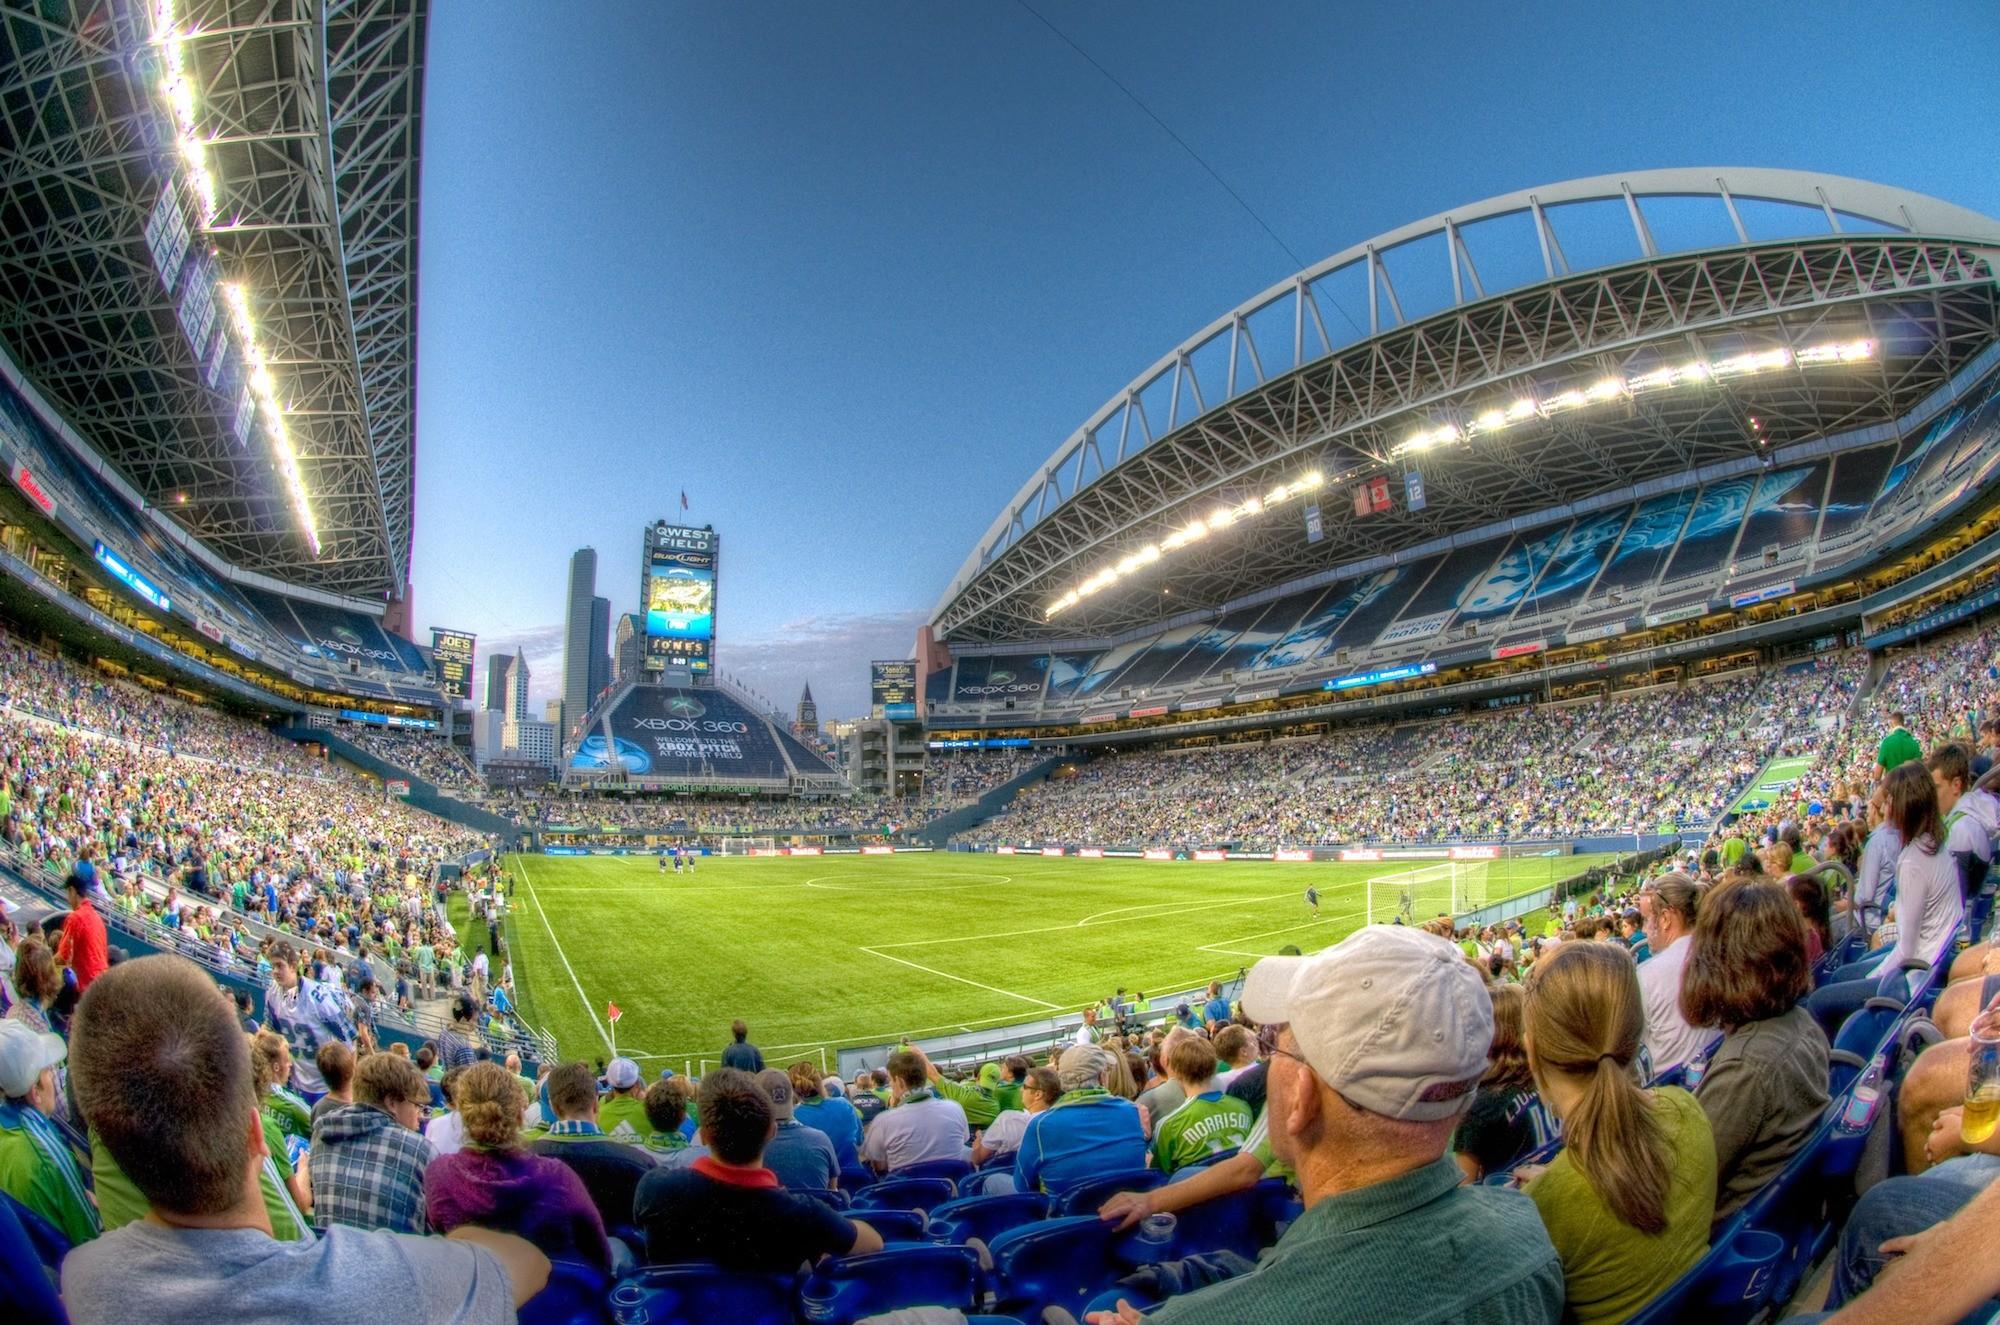 Seattle Qwest Stadium